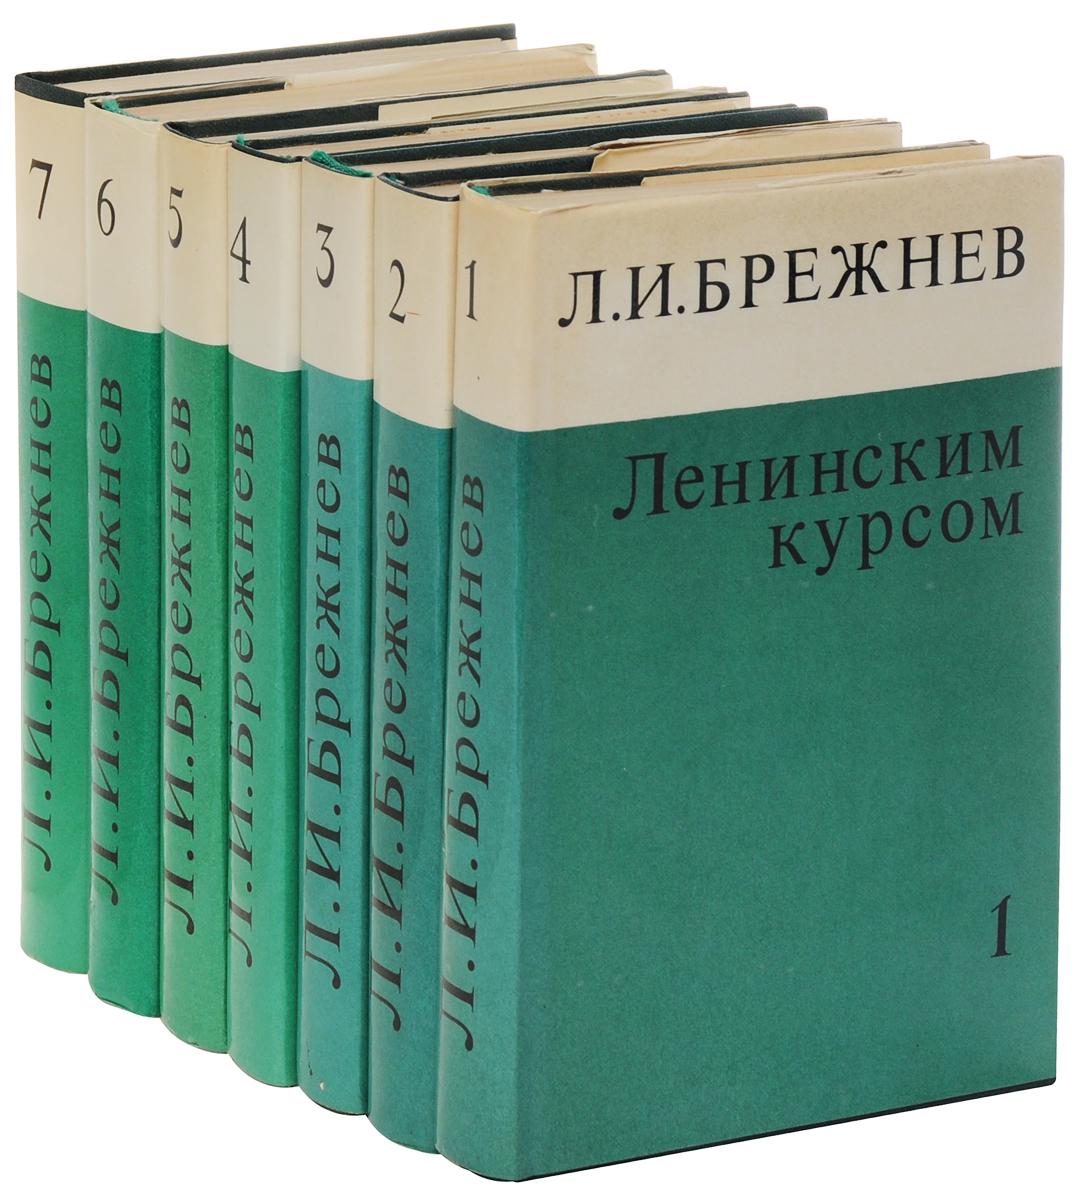 Леонид Брежнев Ленинским курсом (комплект из 7 книг)